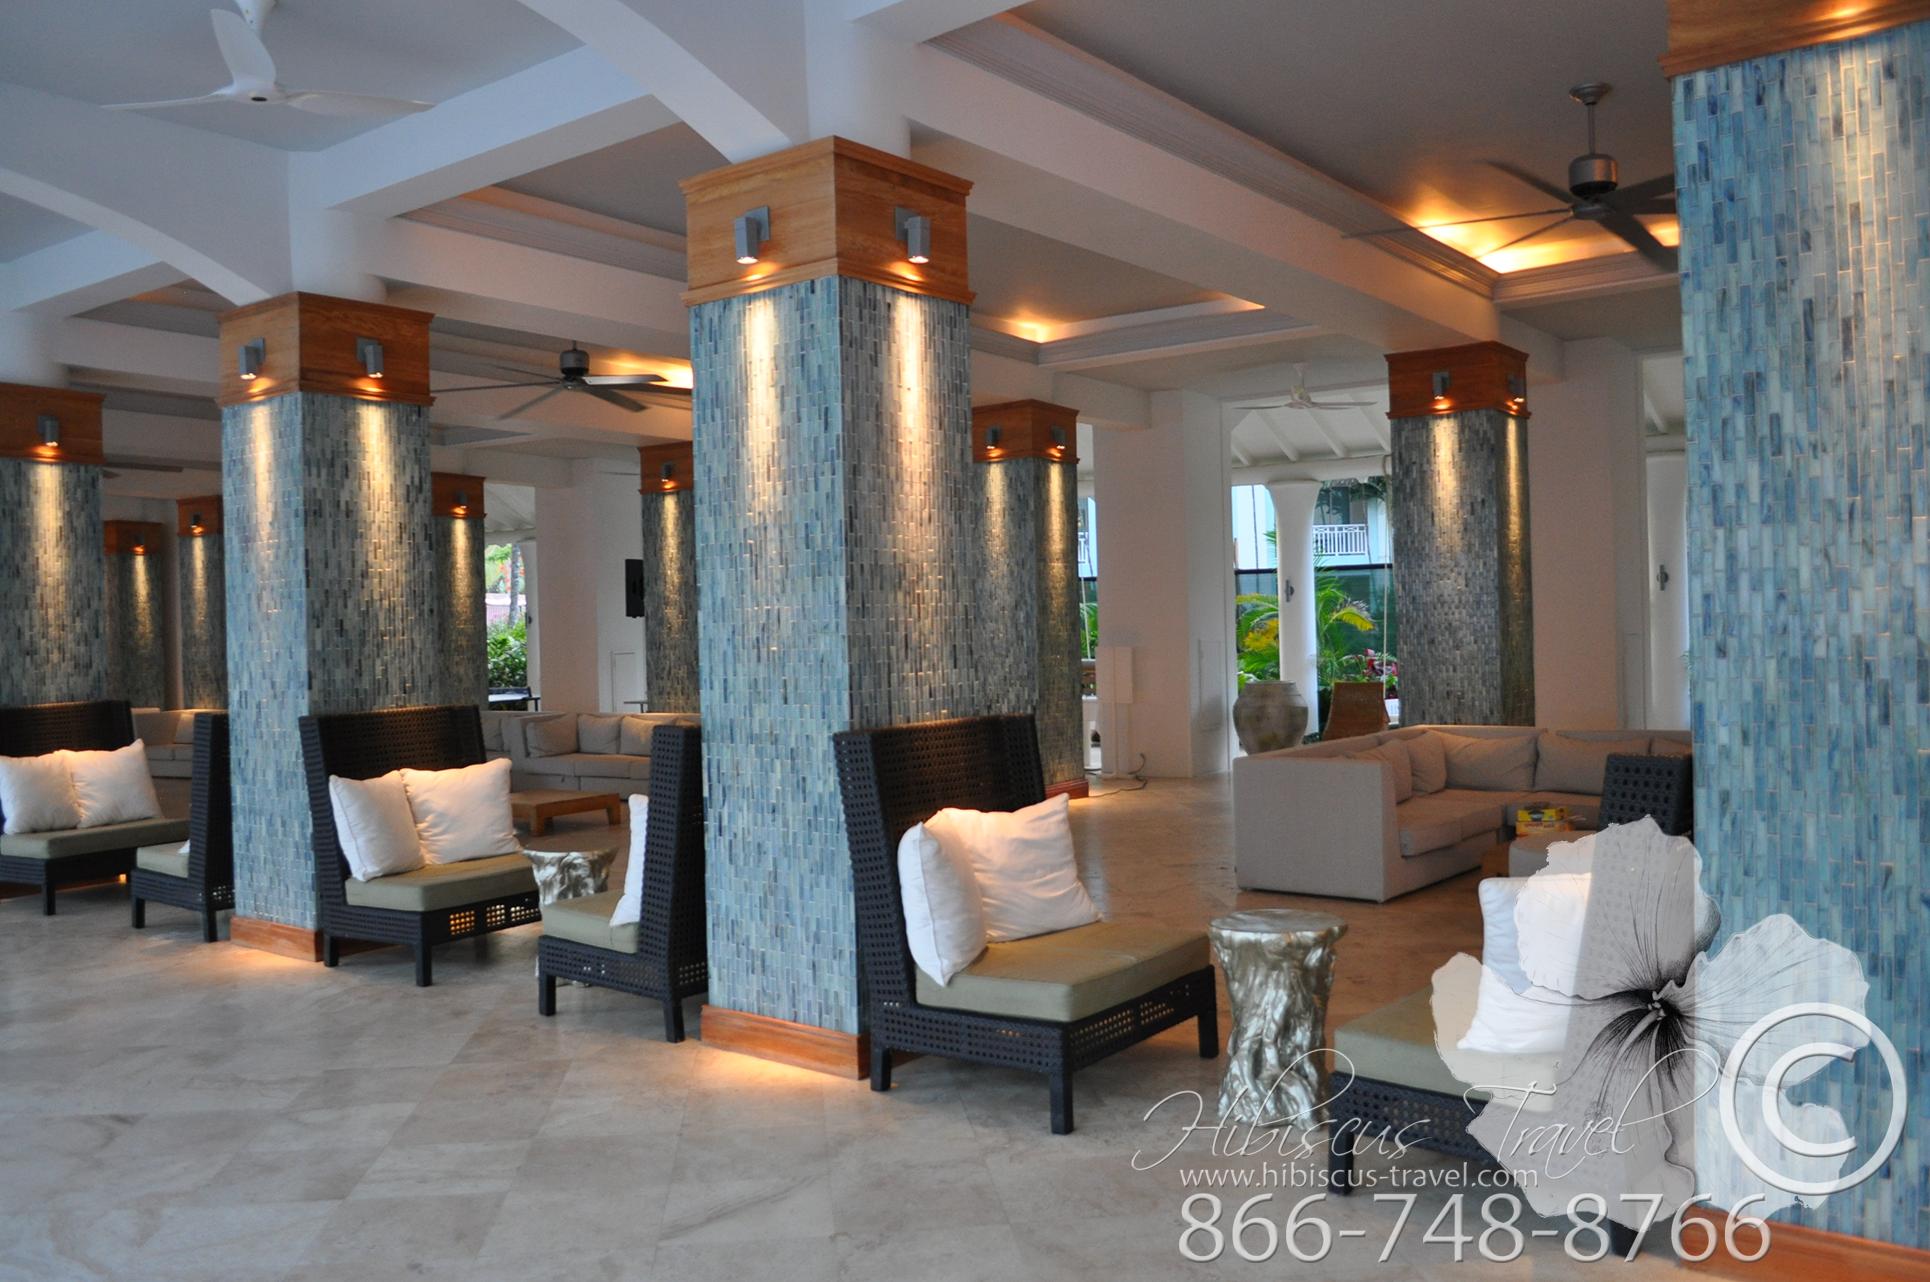 Calypso Lounge & Bar near main pool  #HibiscusTravel @travelhibiscus #SandalsBarbados #destinationwedding #honeymoon www.TheCaribbeanSpecialists.com www.hibiscustravel.net 866.748.8766